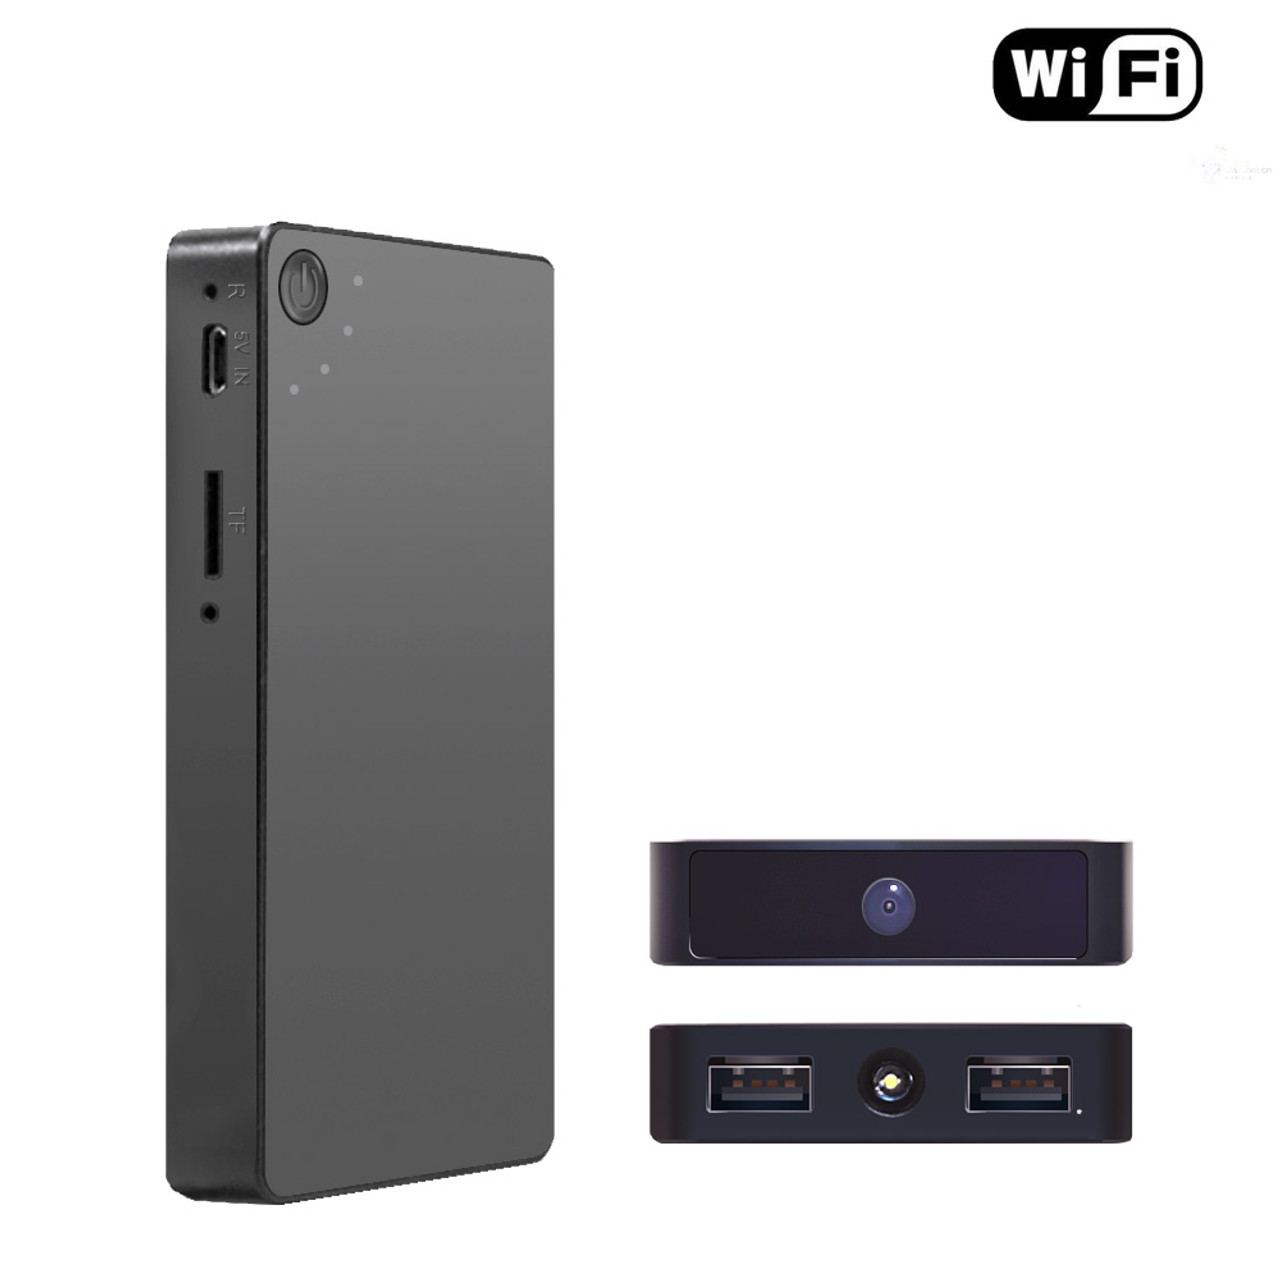 WiFi Camera Power Bank HD 1080P Wireless Security